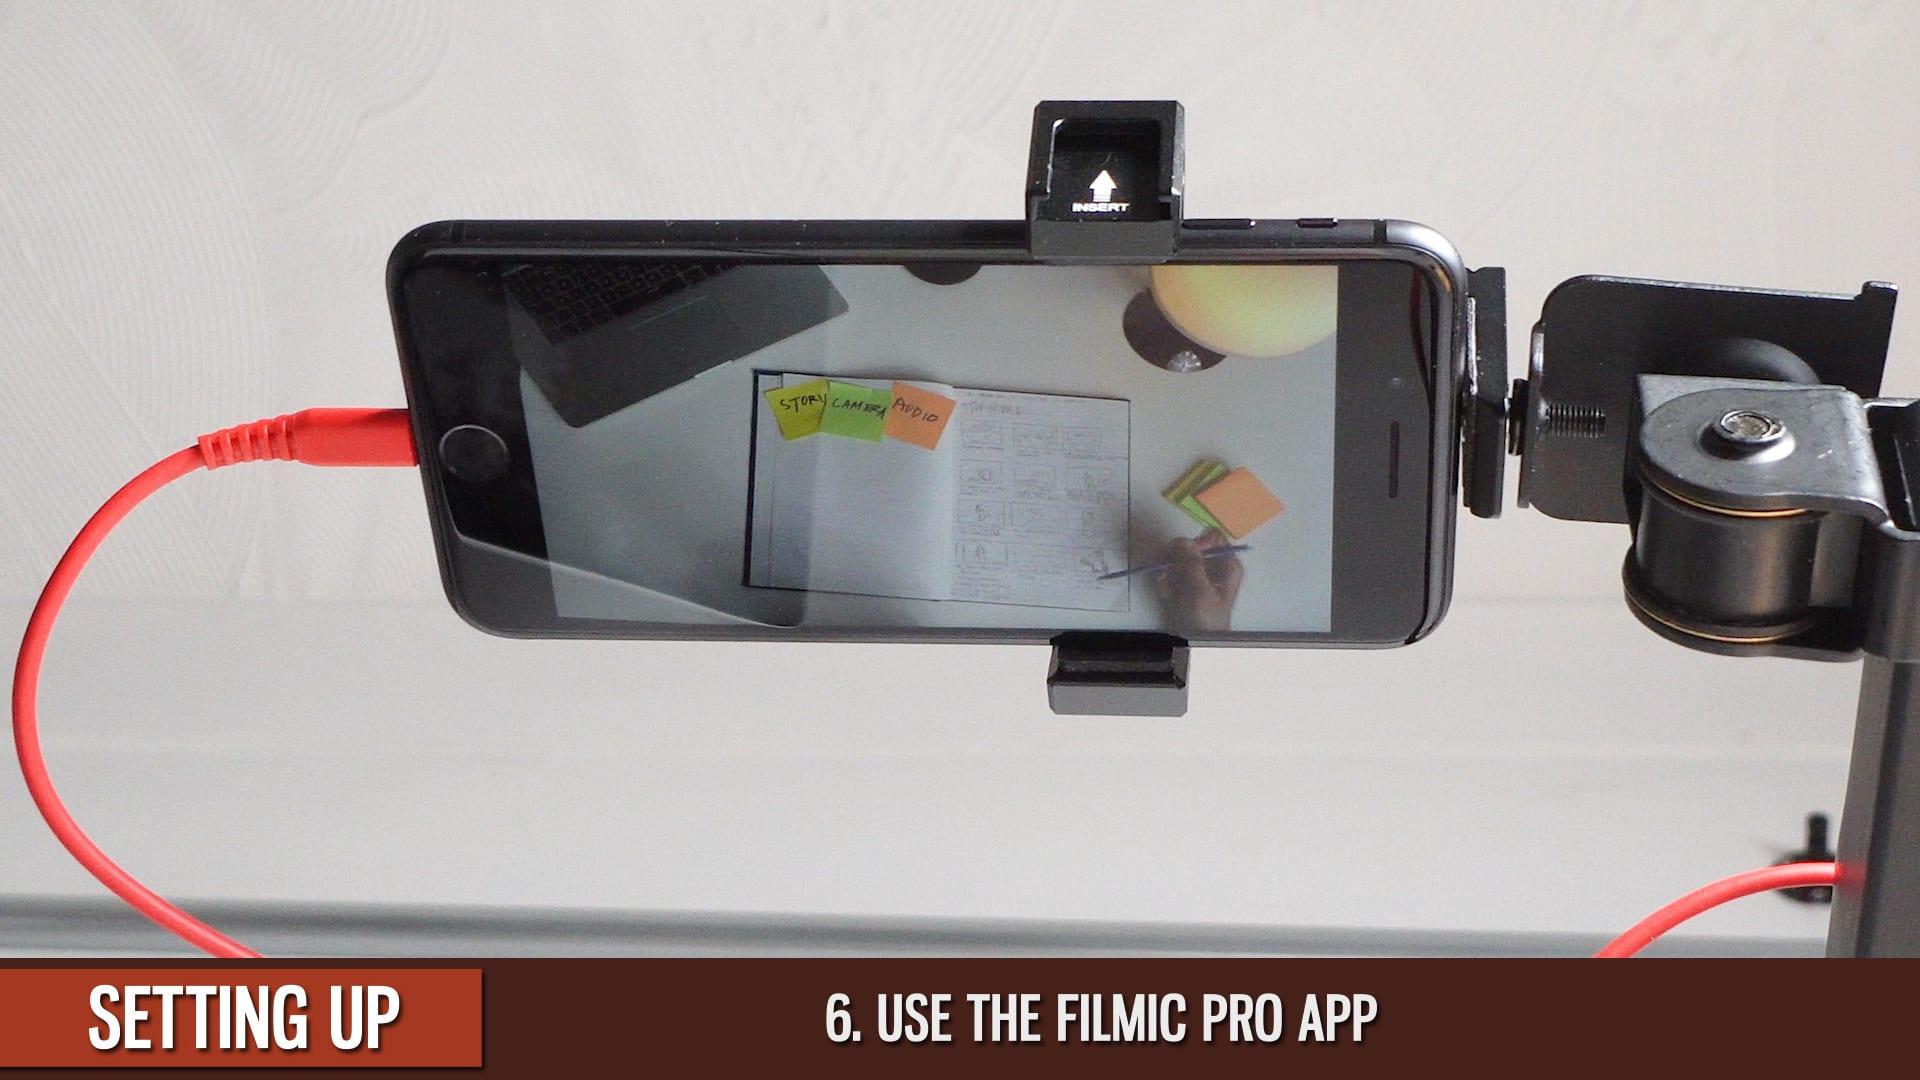 IPhone-Overhead-Use=Filmic-Pro-App